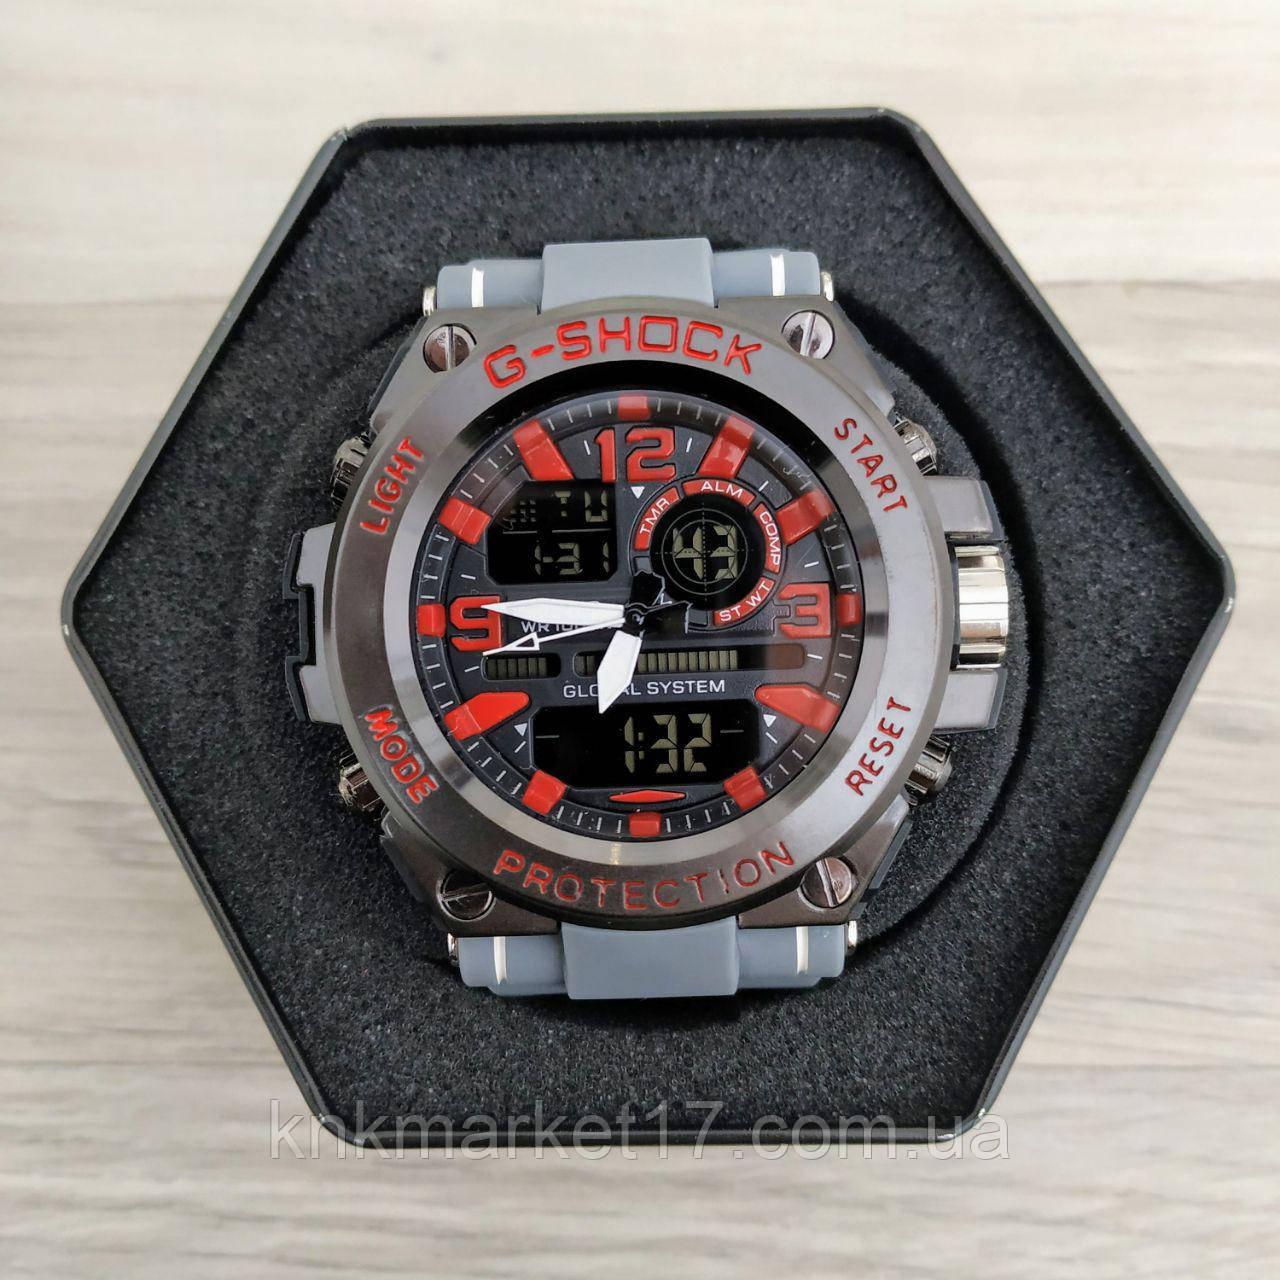 Casio GLG-1000 Gray-Black-Red